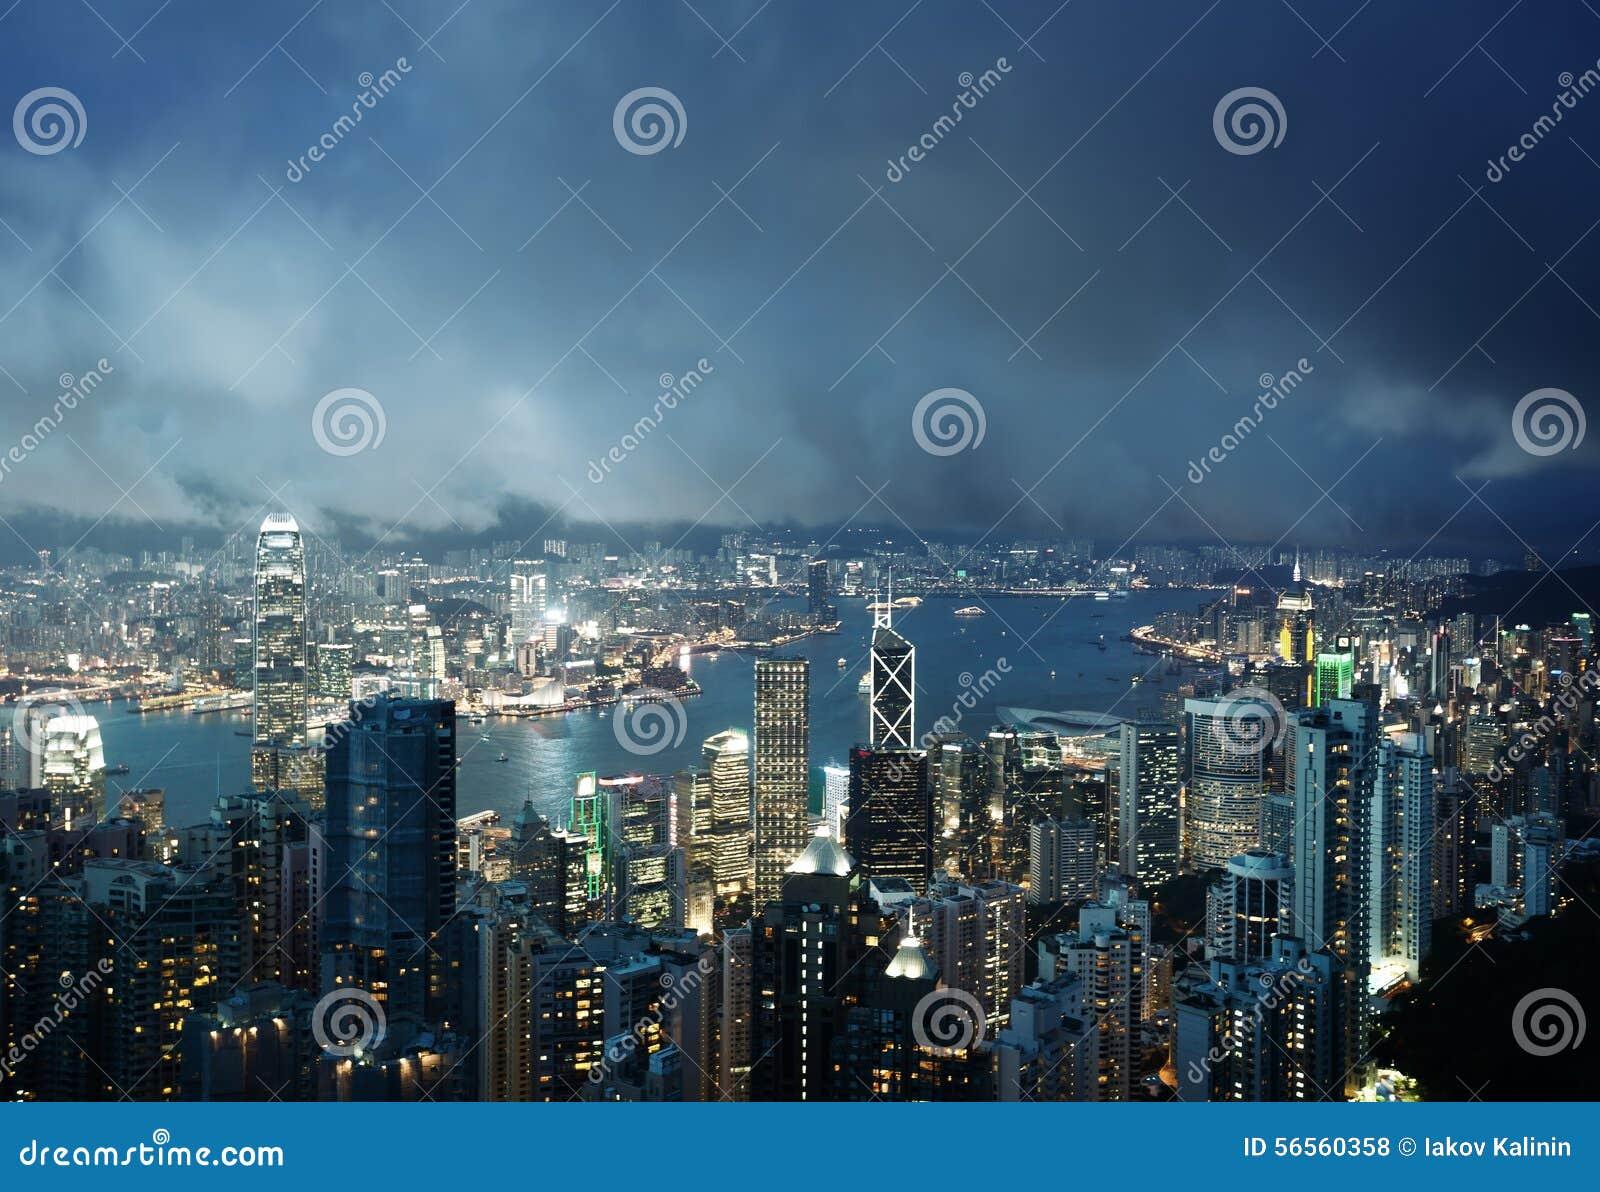 Download Νησί Χονγκ Κονγκ από την αιχμή Βικτώριας Στοκ Εικόνες - εικόνα από κεντρικός, νέο: 56560358